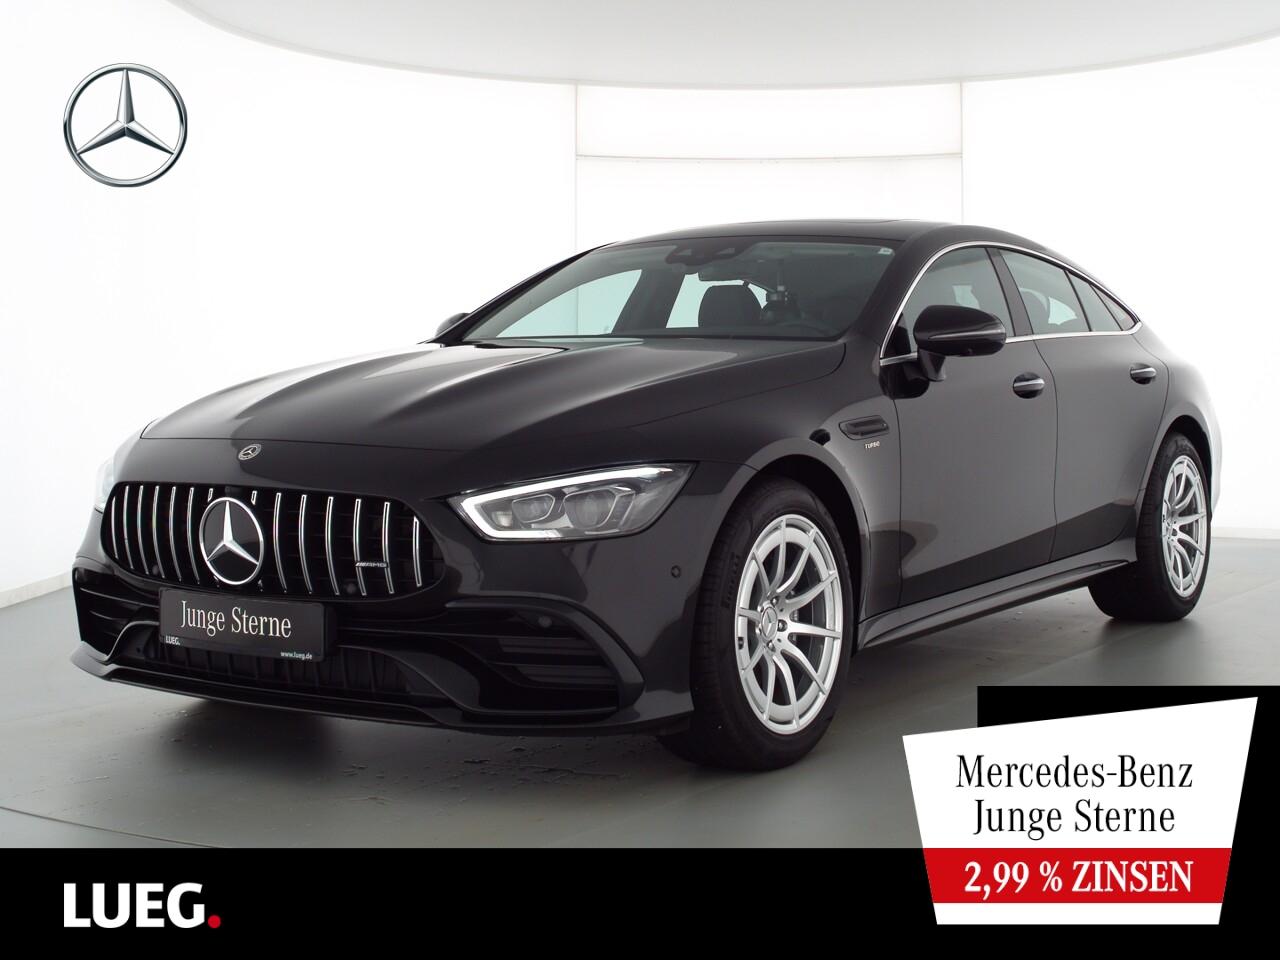 Mercedes-Benz AMG GT 43 MBUX+SHD+Mbeam+RIDE+Carbon+Widesc+360°, Jahr 2020, Benzin